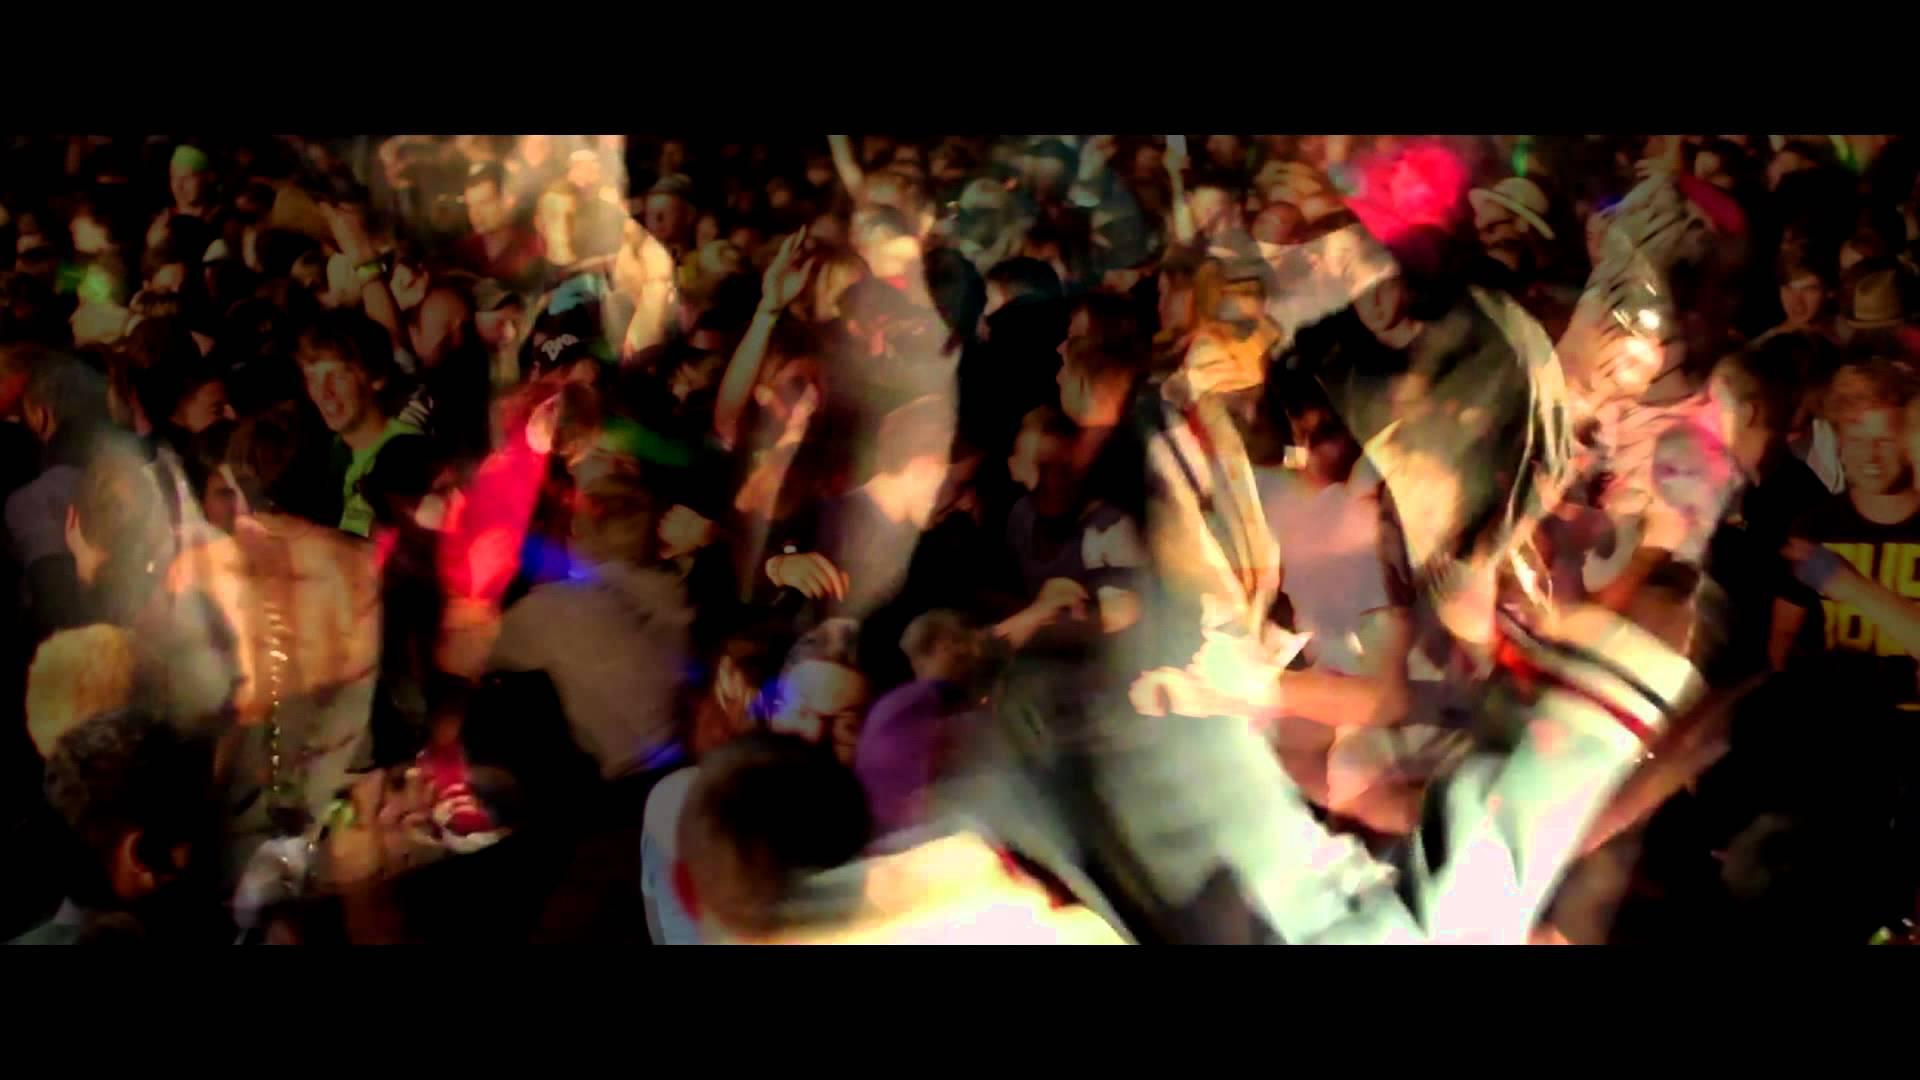 Mono & Nikitaman - Das Alles (LIVE) [9/19/2012]